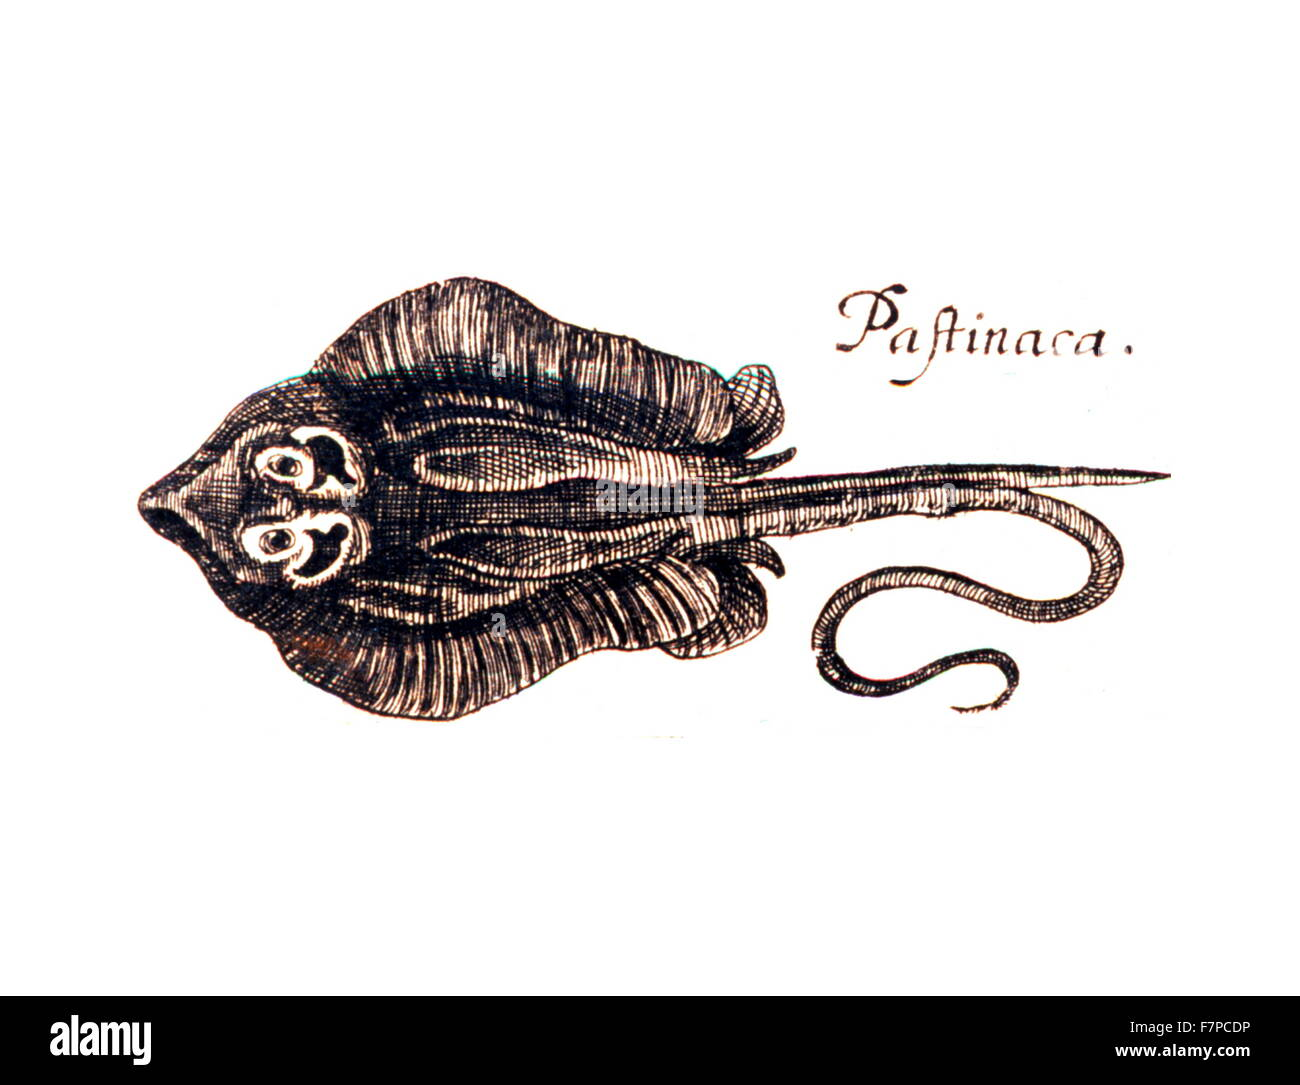 Pastinaca fish illustration from 'Specula physico-mathematico-historica' by Johann Zahn.1696 - Stock Image